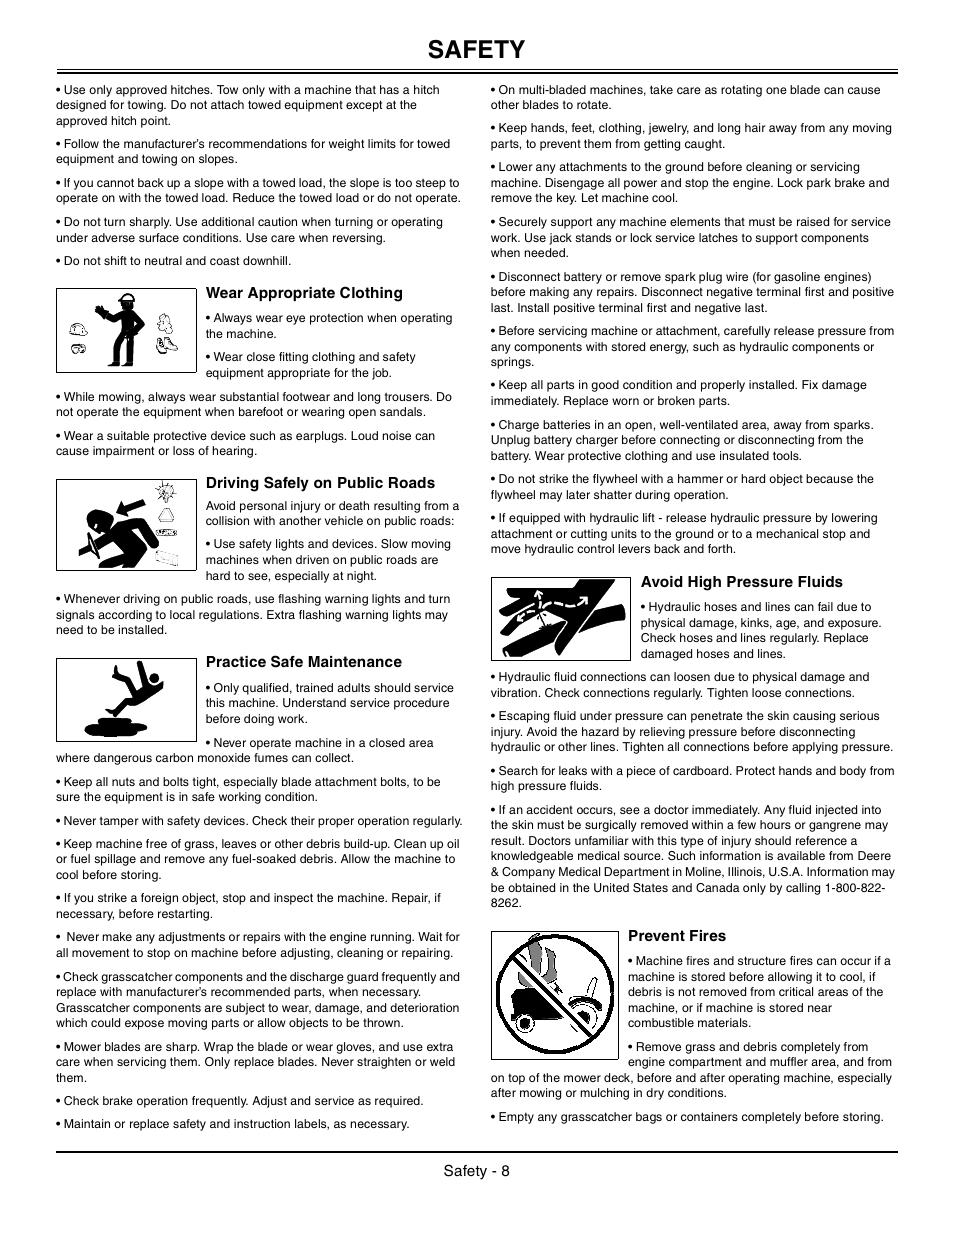 wear appropriate clothing driving safely on public roads practice rh manualsdir com Alcatel Tracfone Manual Alcatel Tracfone Manual